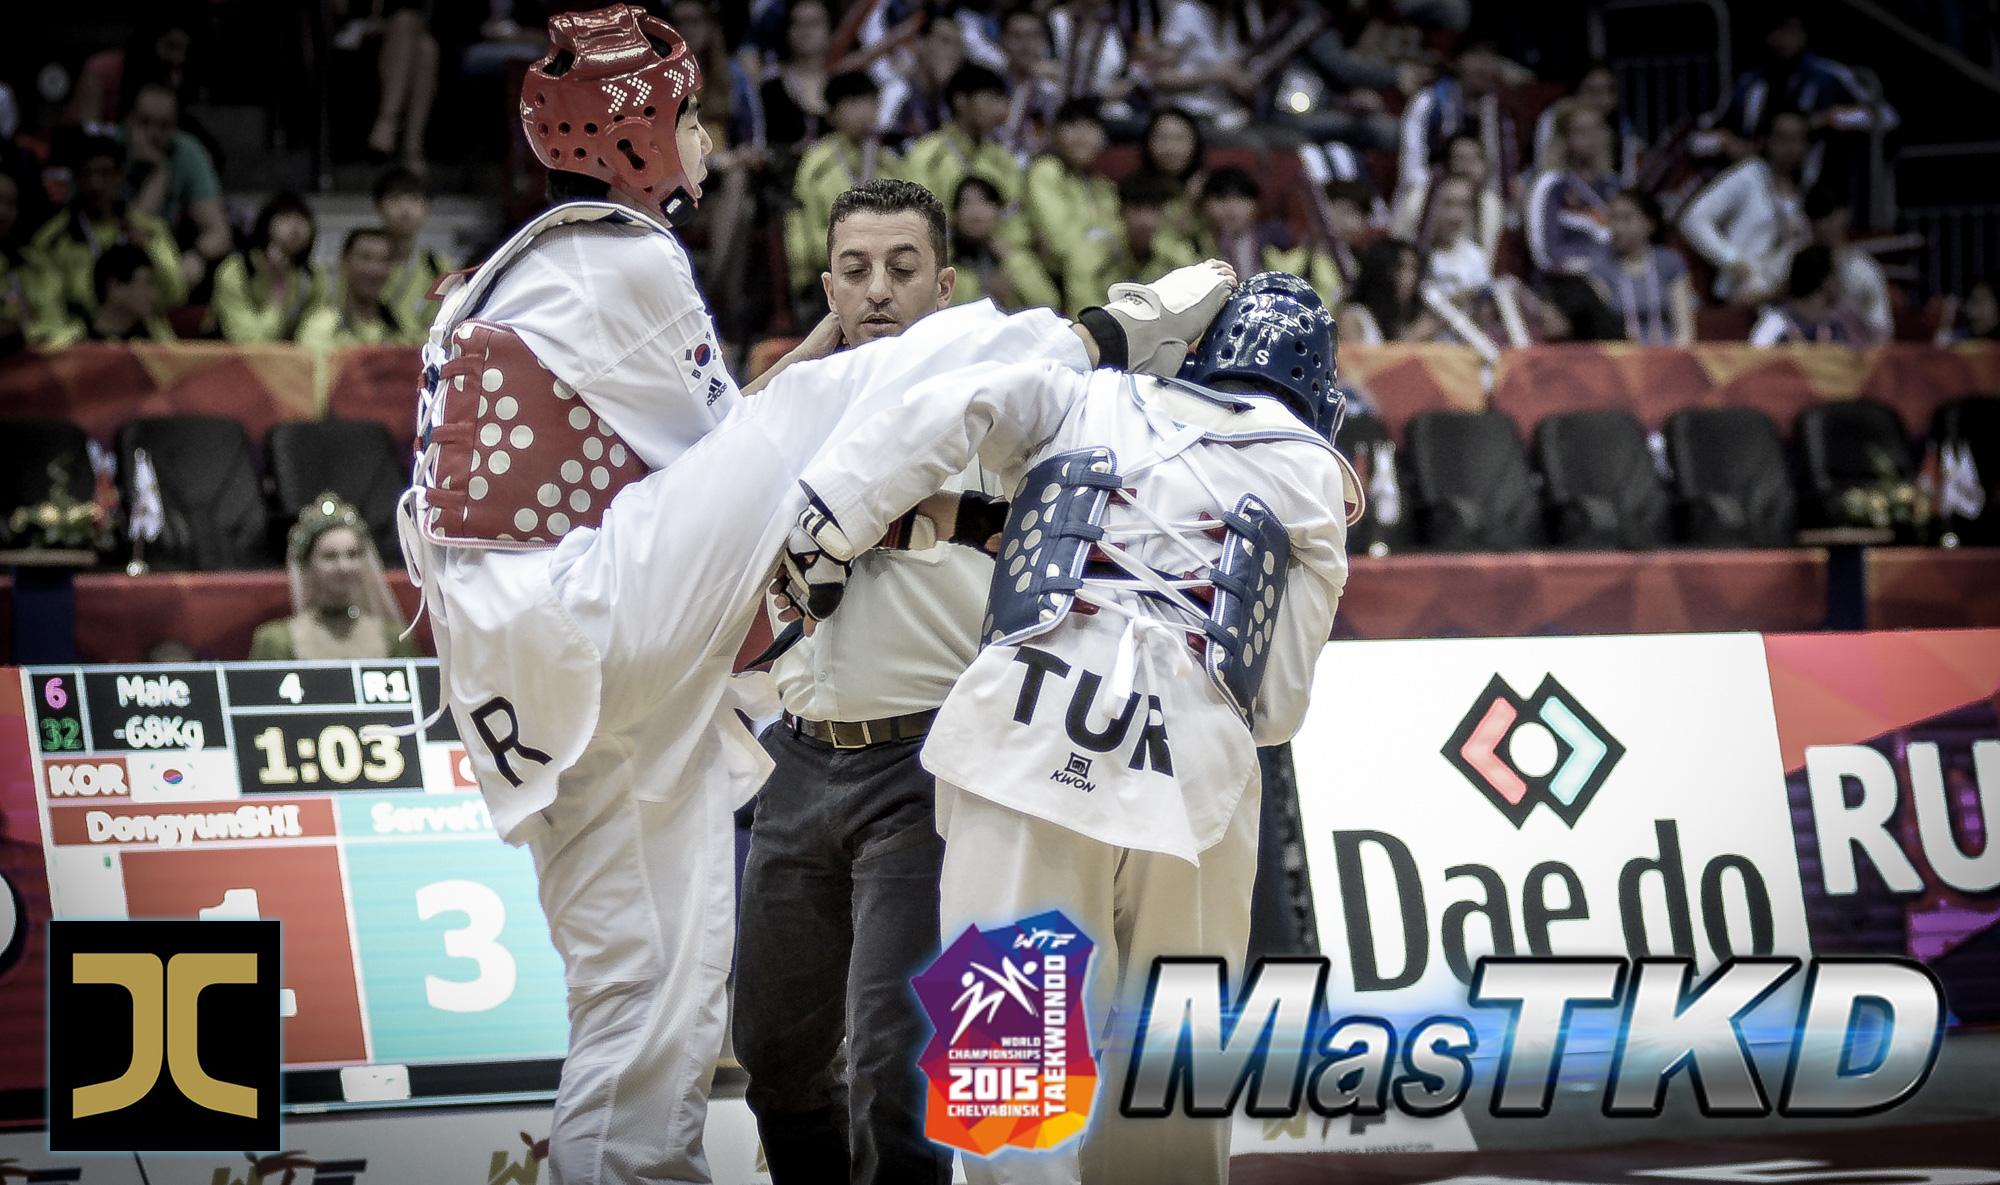 05_JCalicu-Mundial-Taekwondo-Mejores-Imagenes_